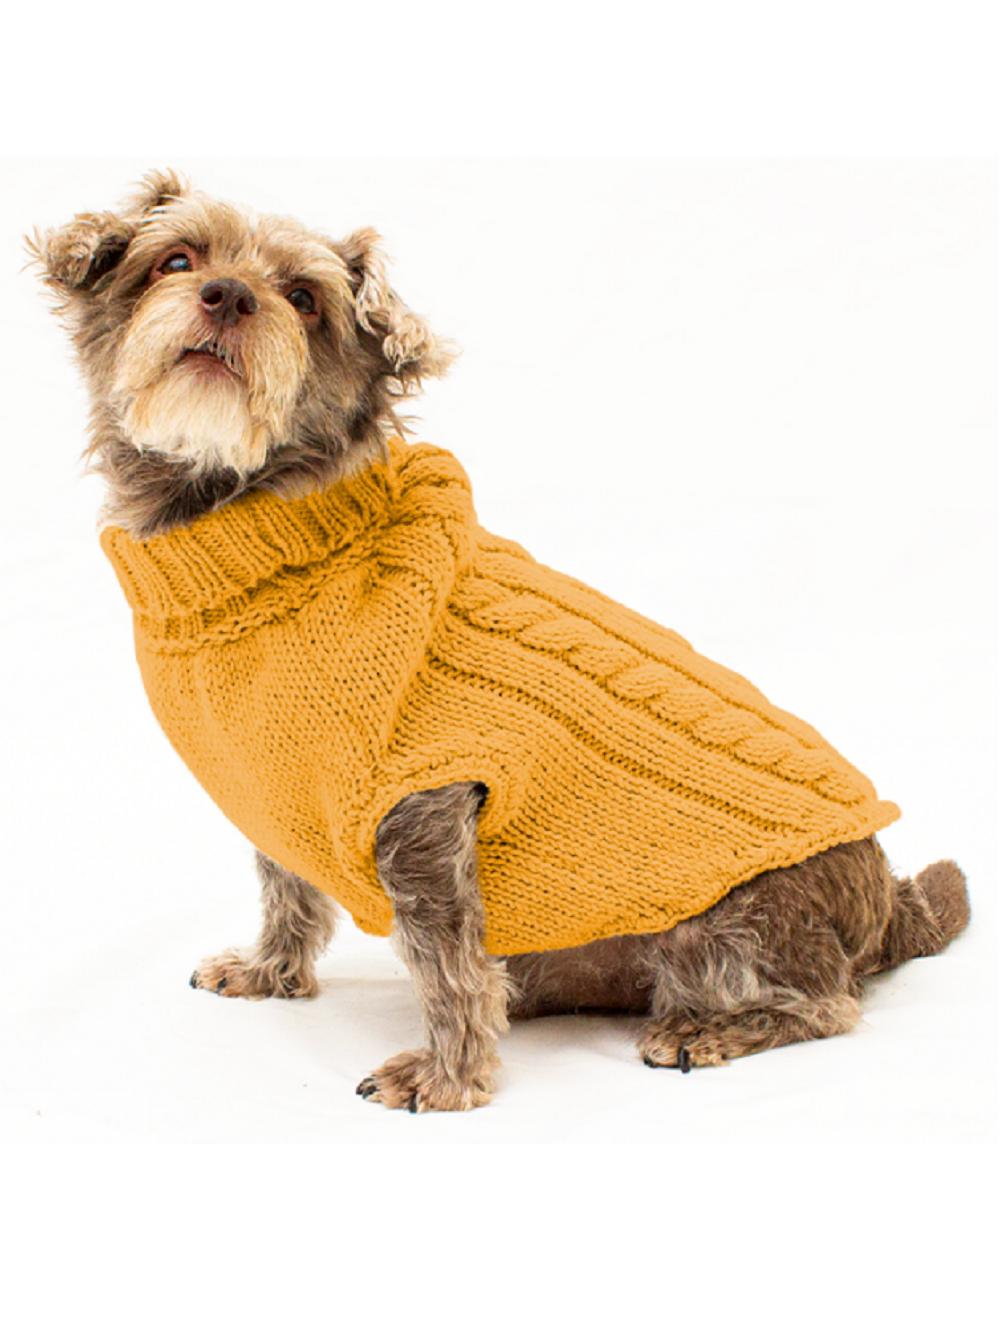 Ropa para perro Saco Parker amarillo Talla L - Ciudaddemascotas.